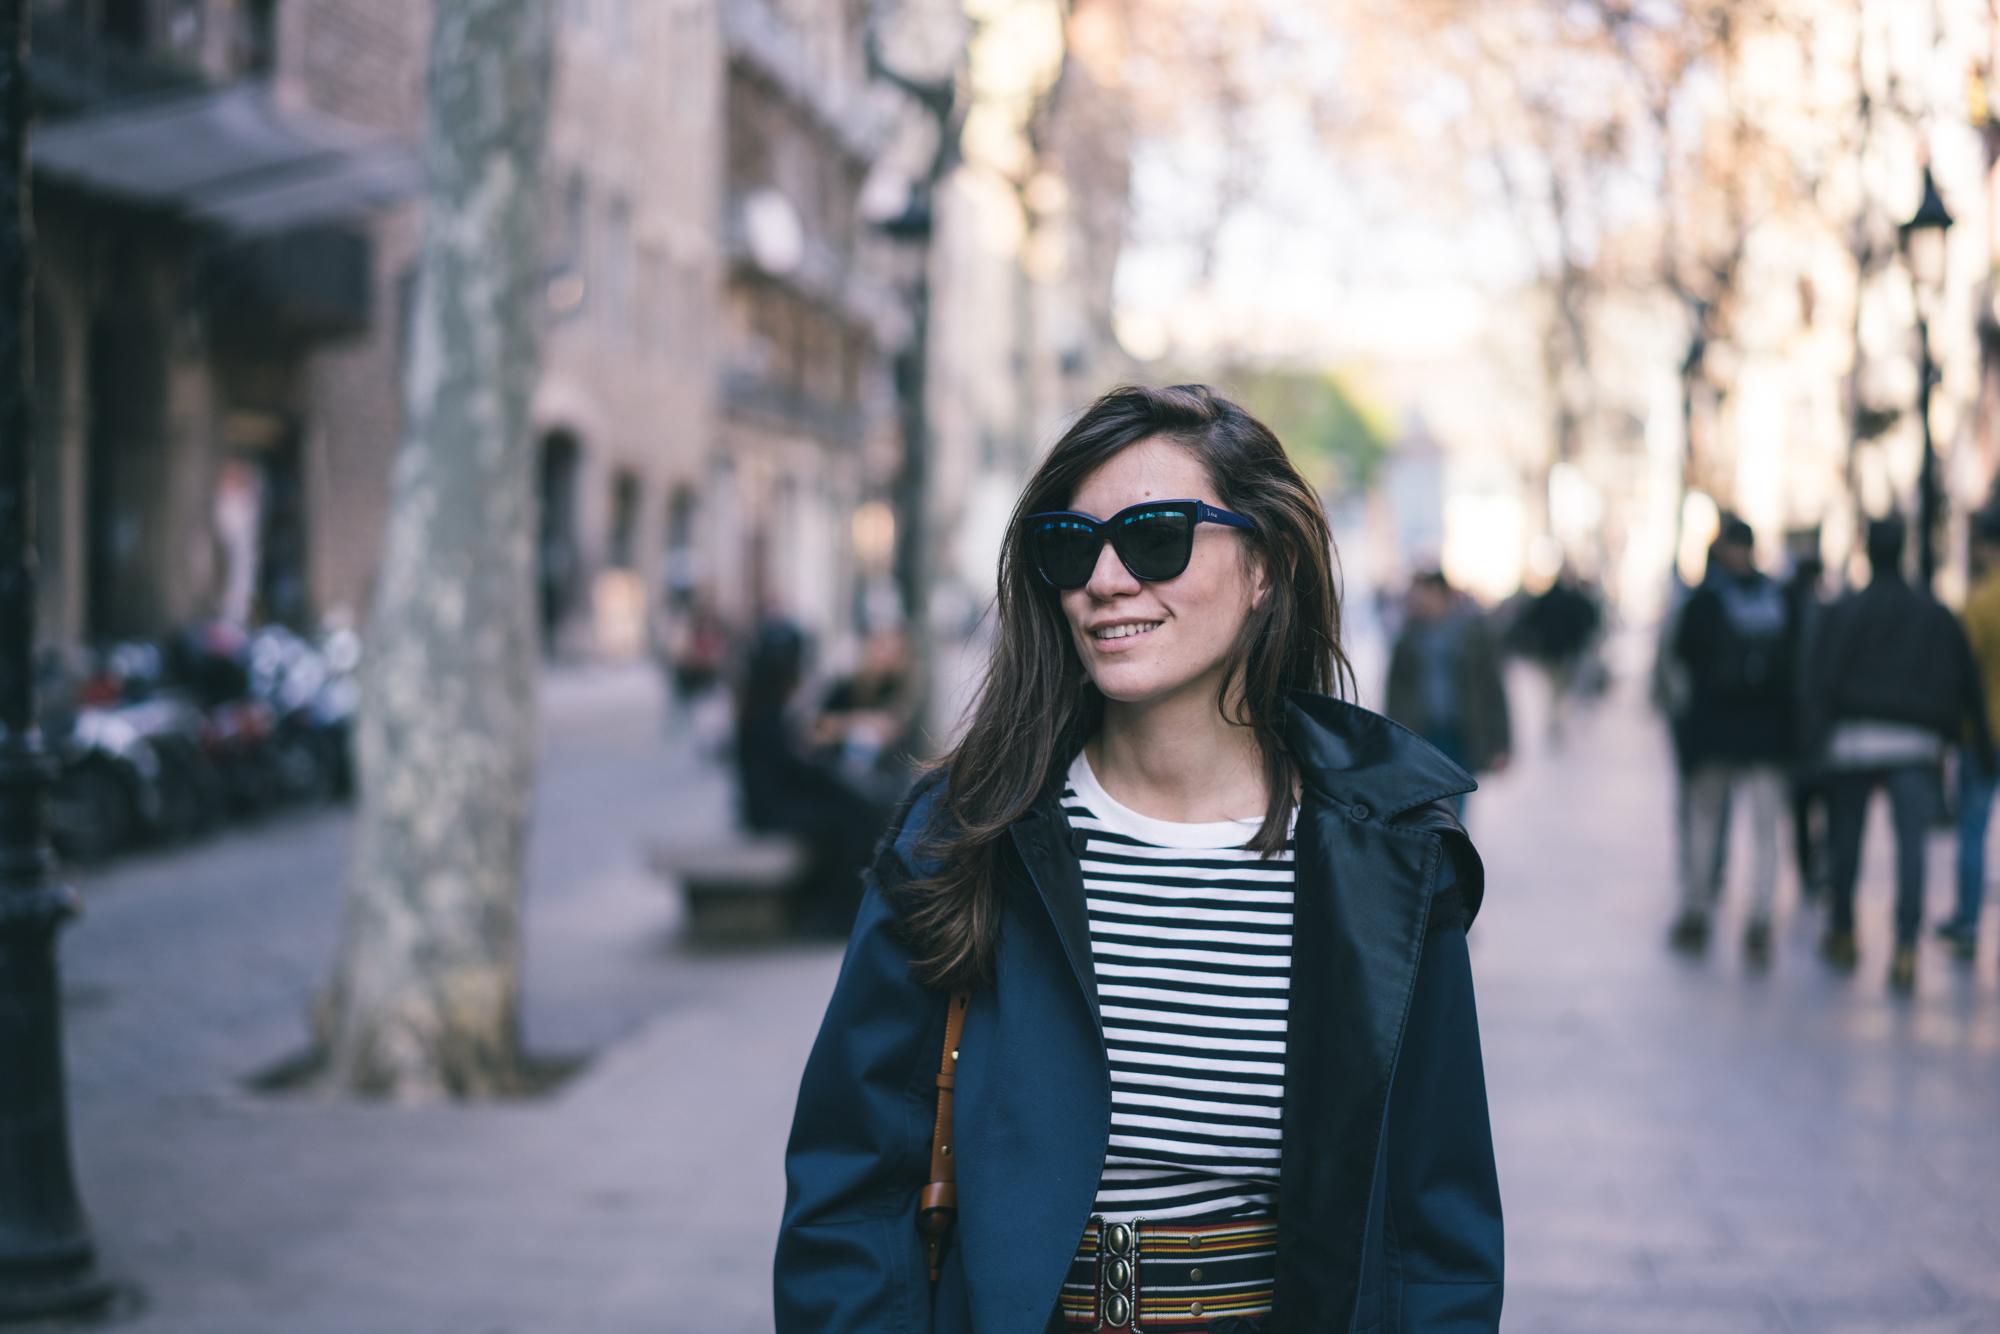 billurbarcelonadiary, travel, billur saatci, off ne giysem, offnereyegitsem, lifestyle blogger, turkish style blogger, barcelona, barceloneta, lug von siga, le swing vintage&blow, lug von siga, anna sui, cos, moorer